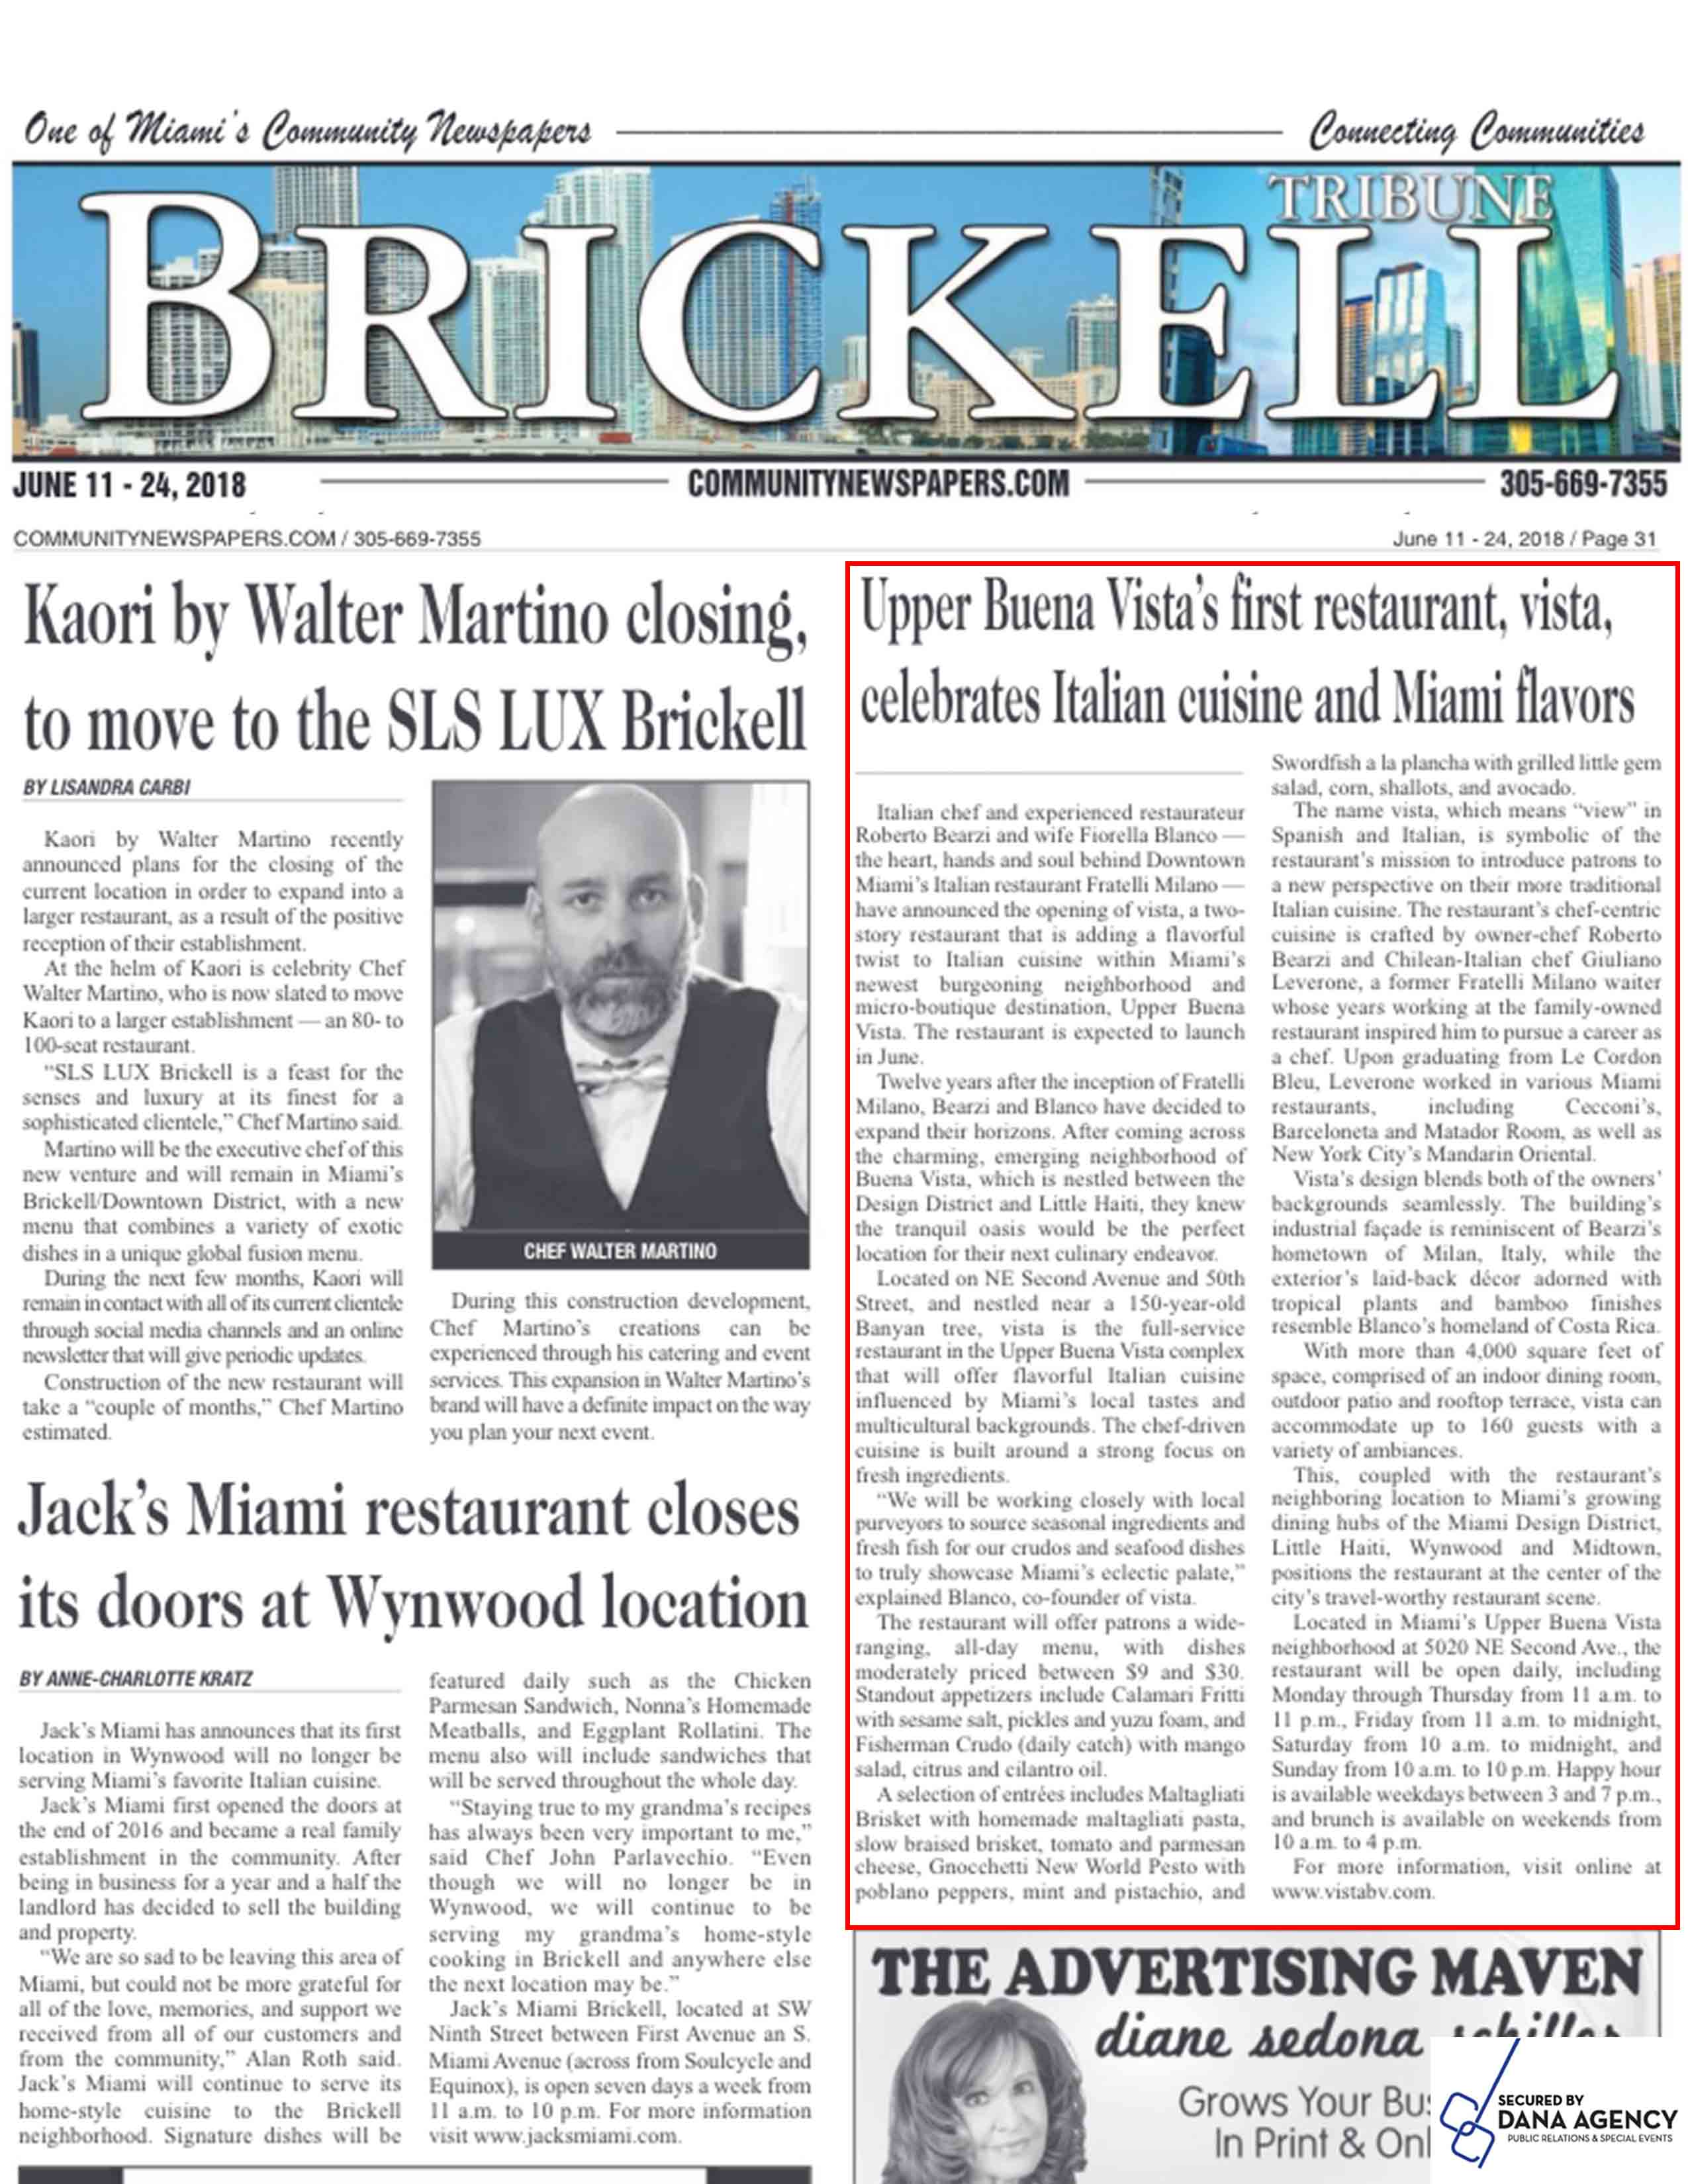 BrickellTribune_6.11.18_Print_Page2